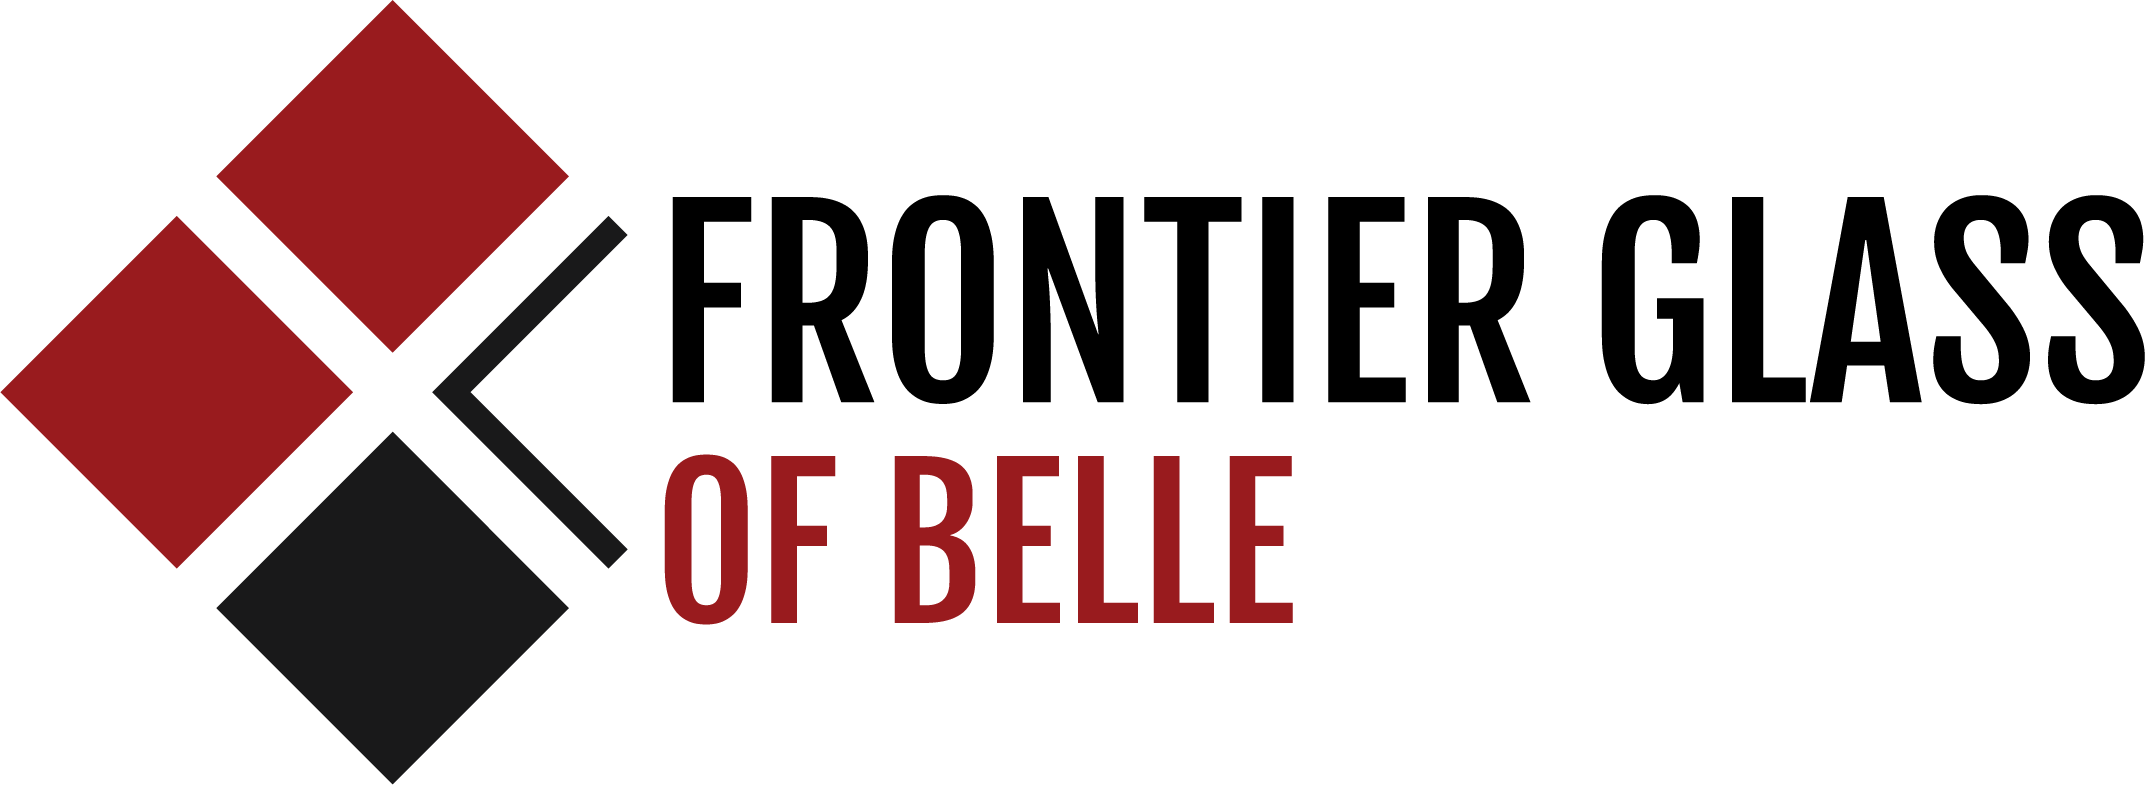 Frontier Glass of Belle